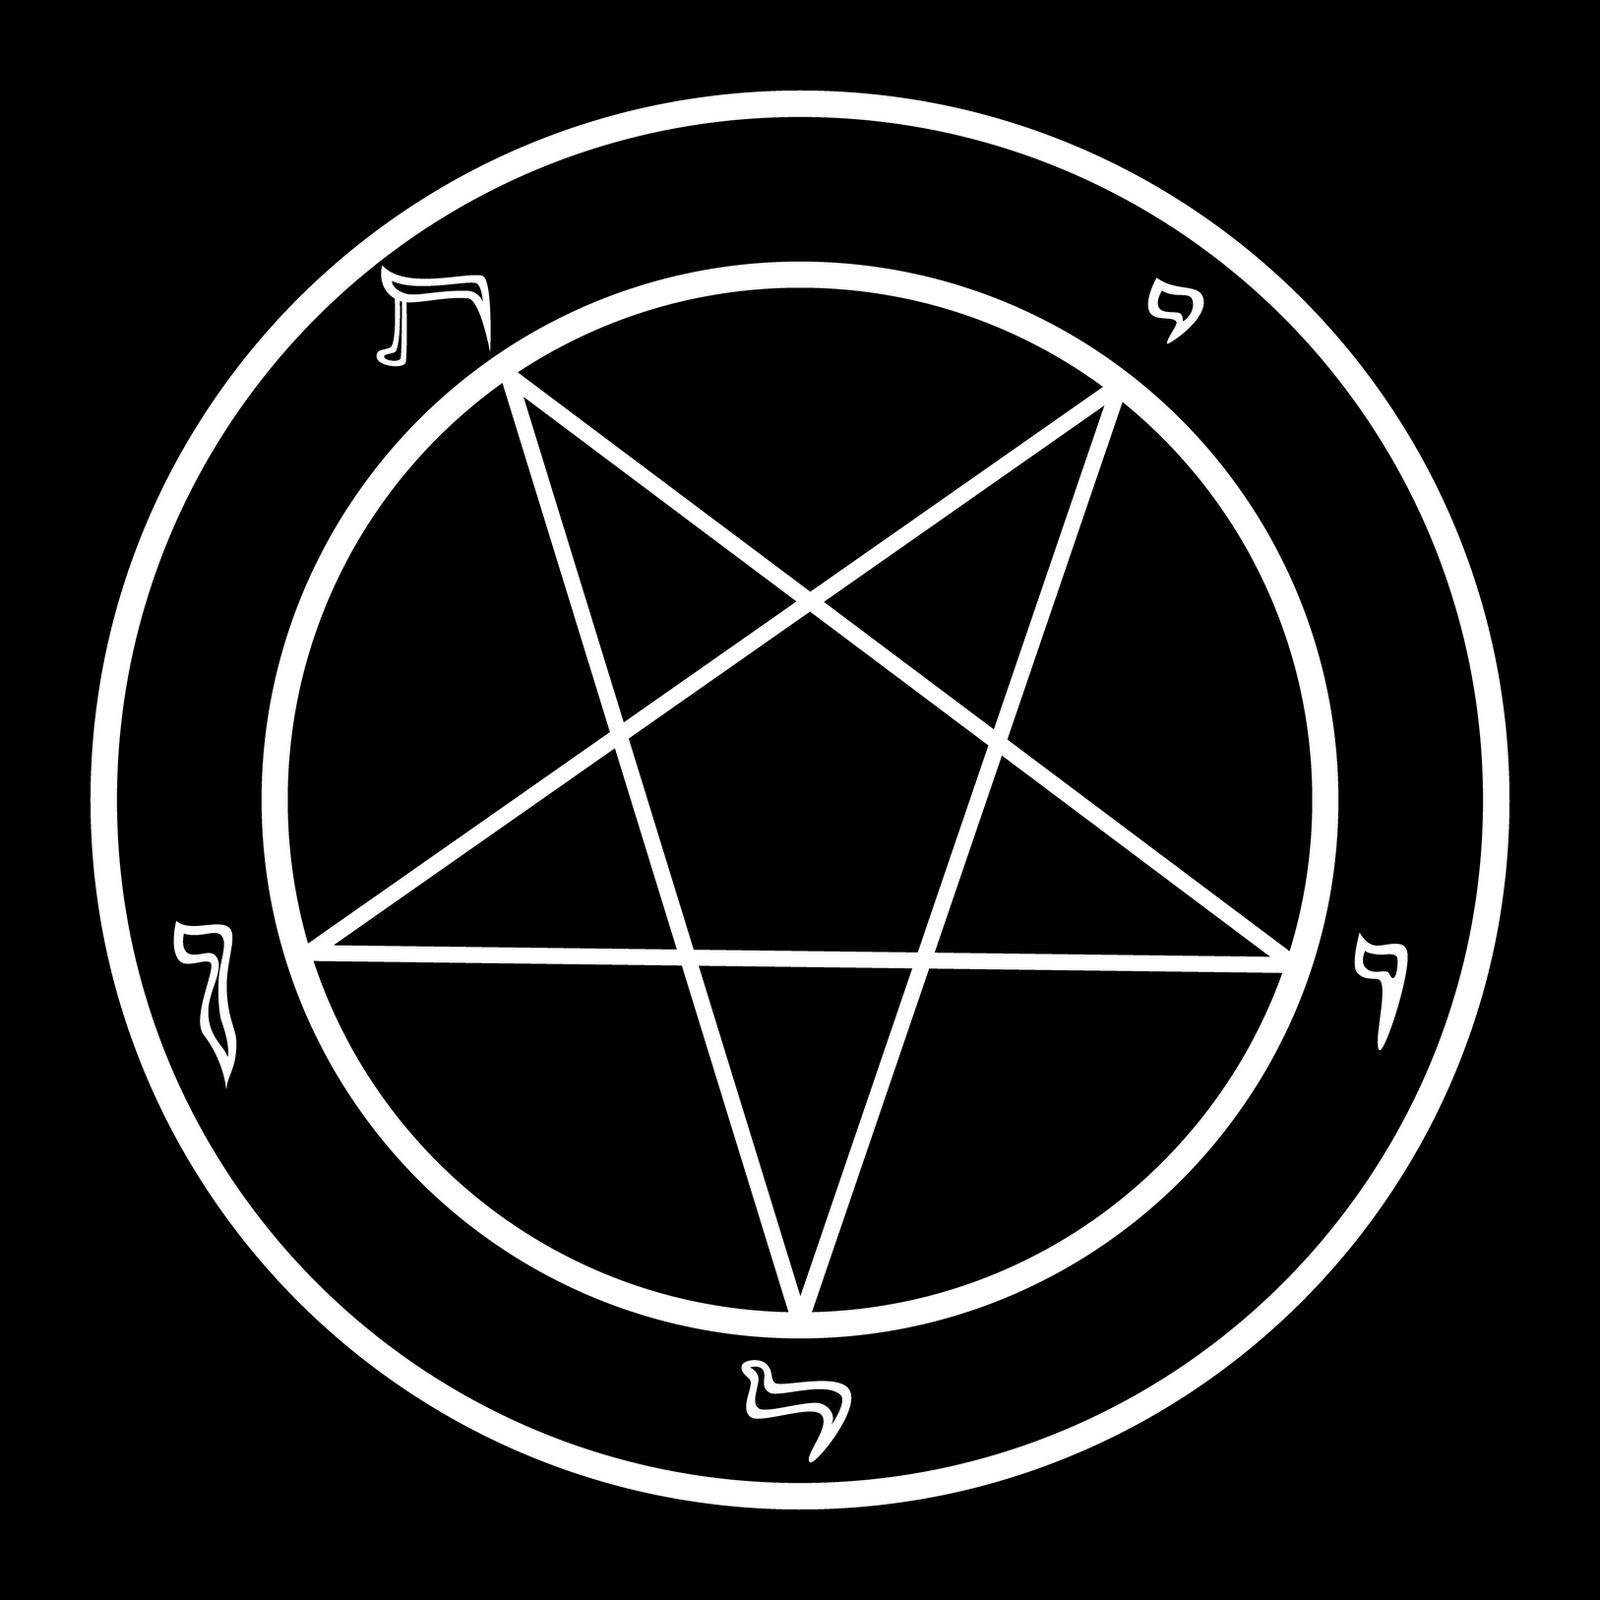 Baphomets Pentagram Vector 4k By Nousernameremain On Deviantart